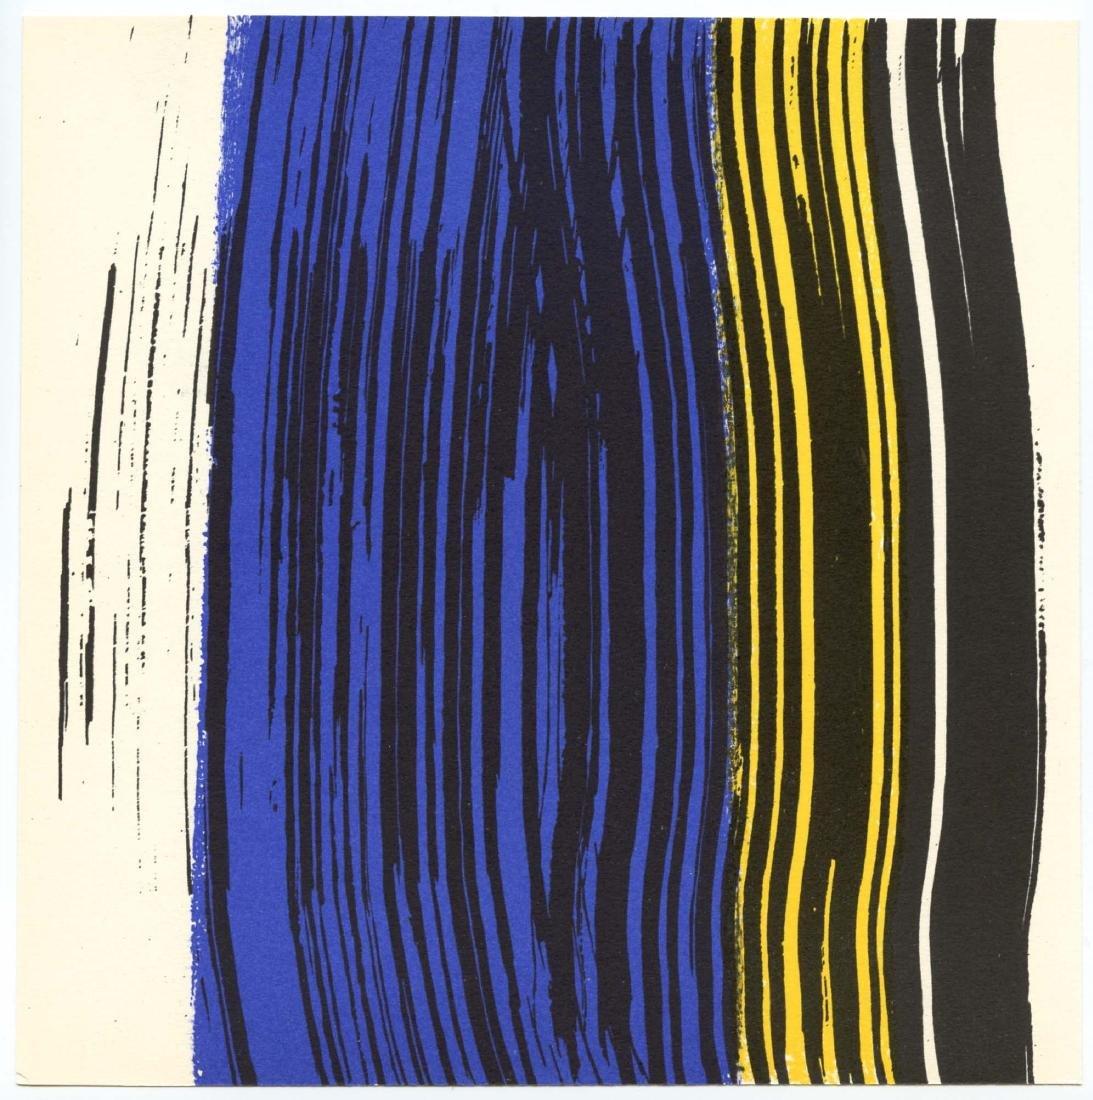 Hans Hartung lithograph, 1971